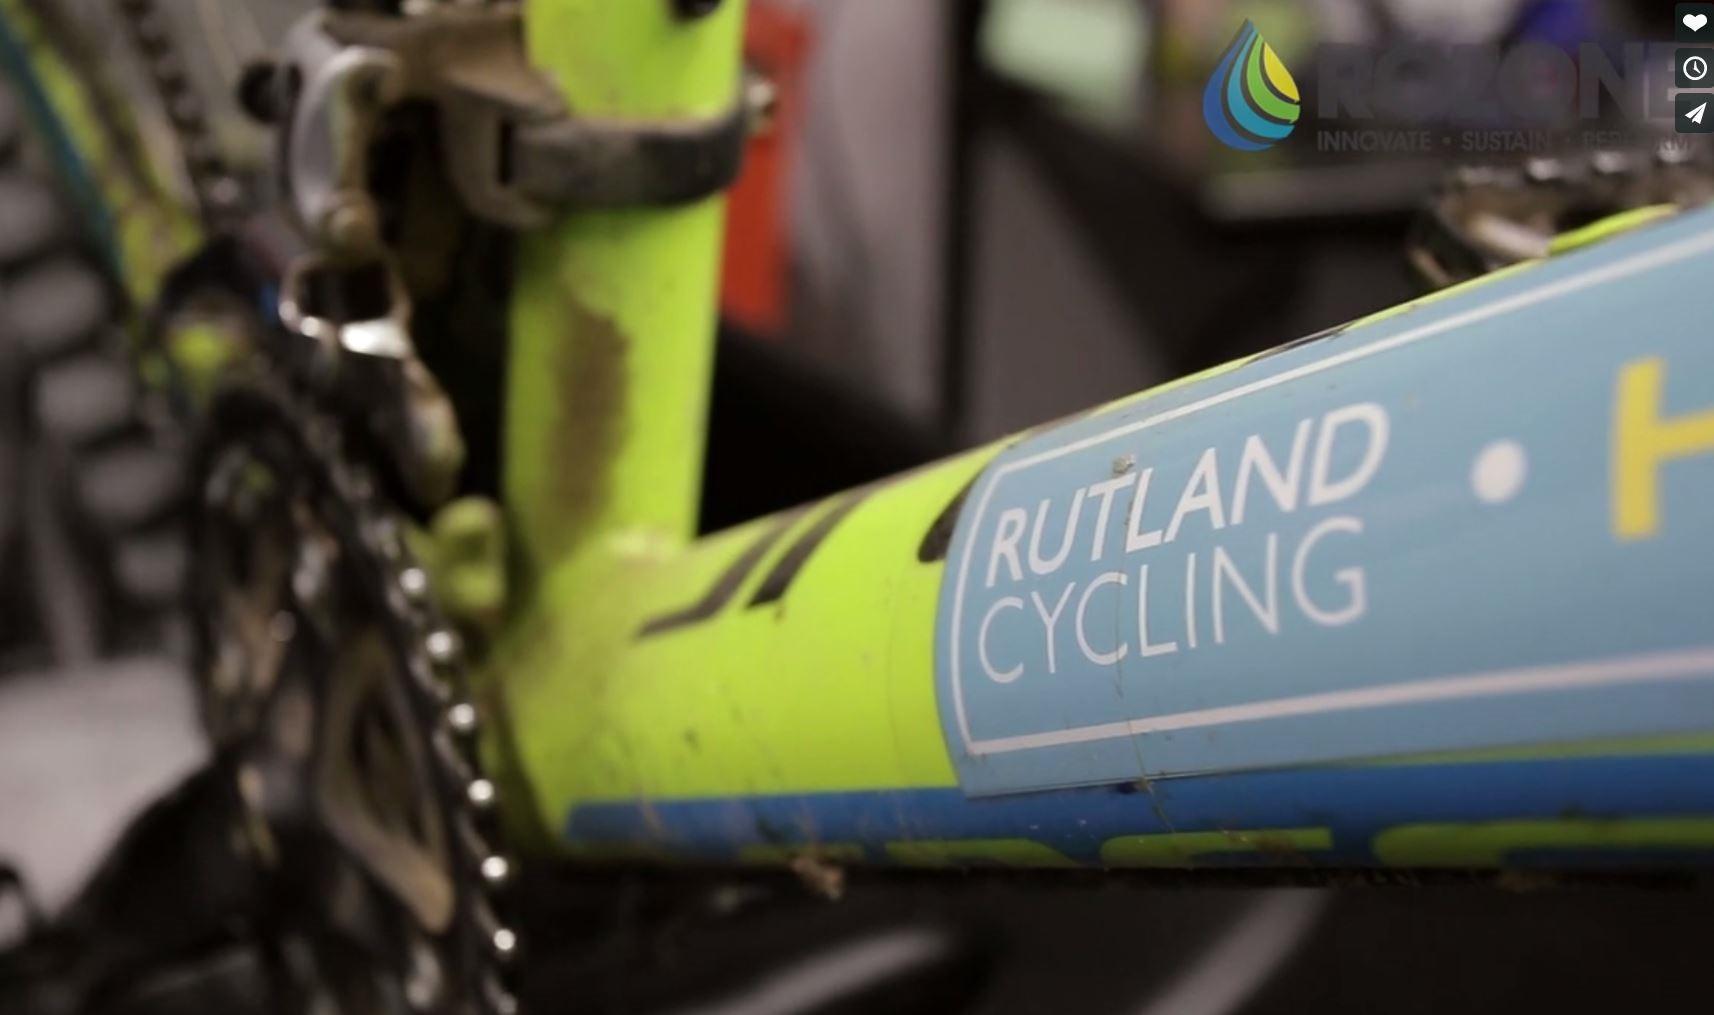 Rozone Smartwasher at Rutland Cycling